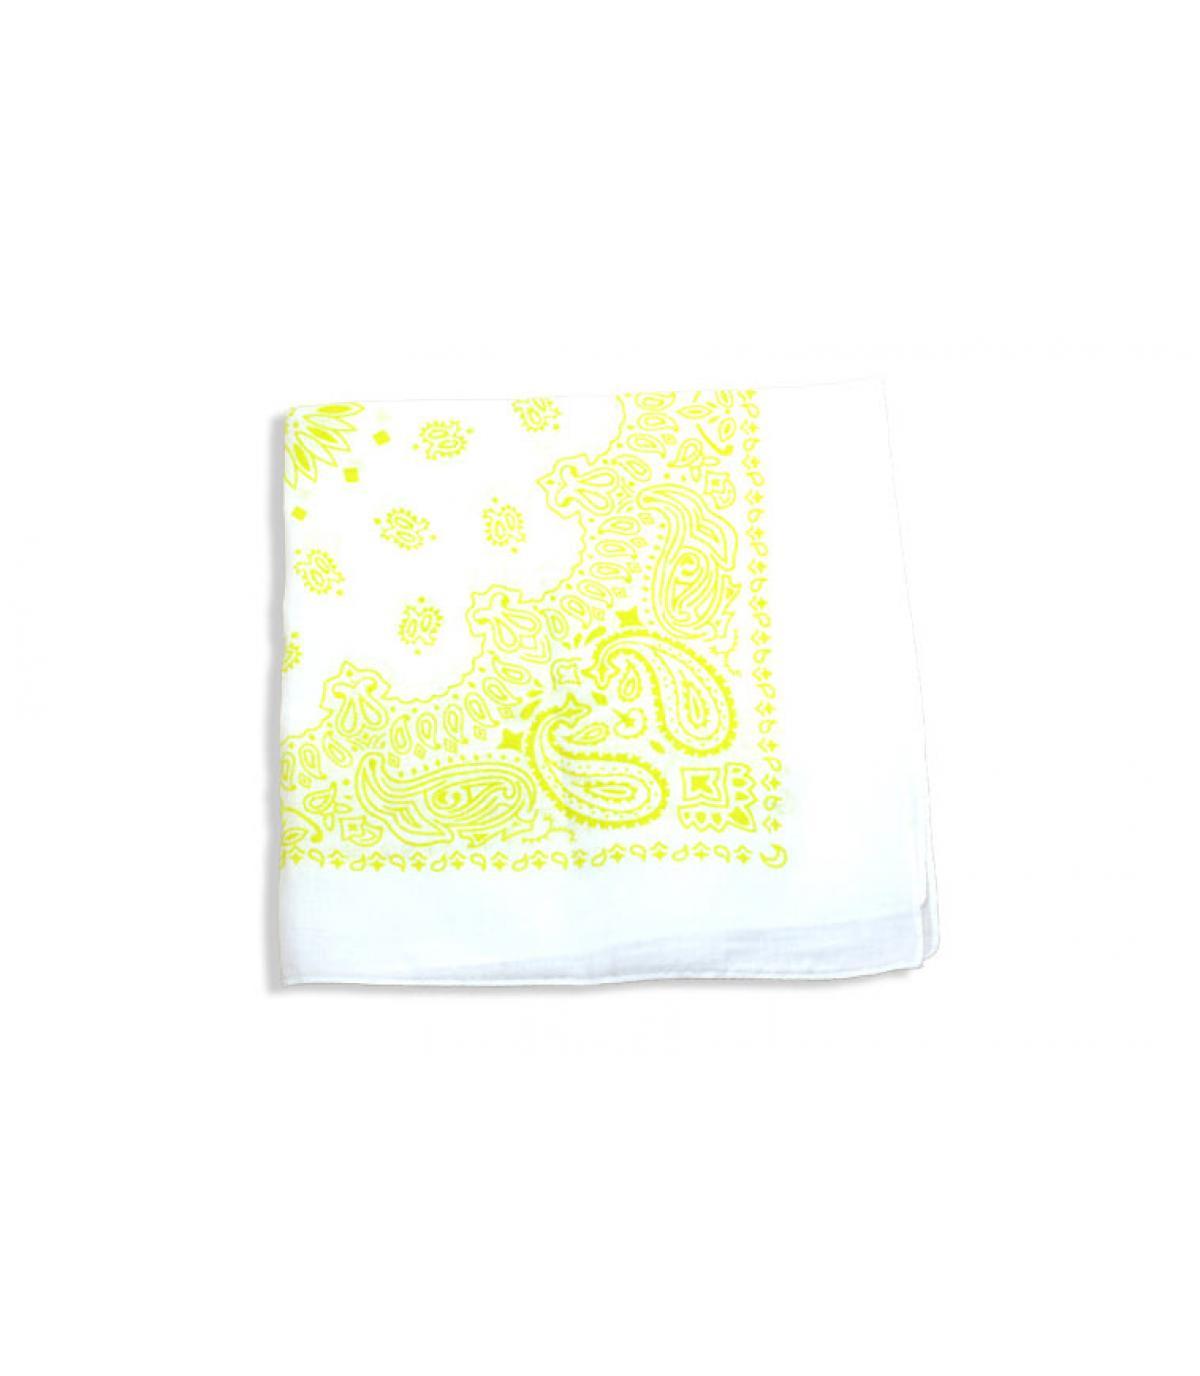 bandana bianca e gialla